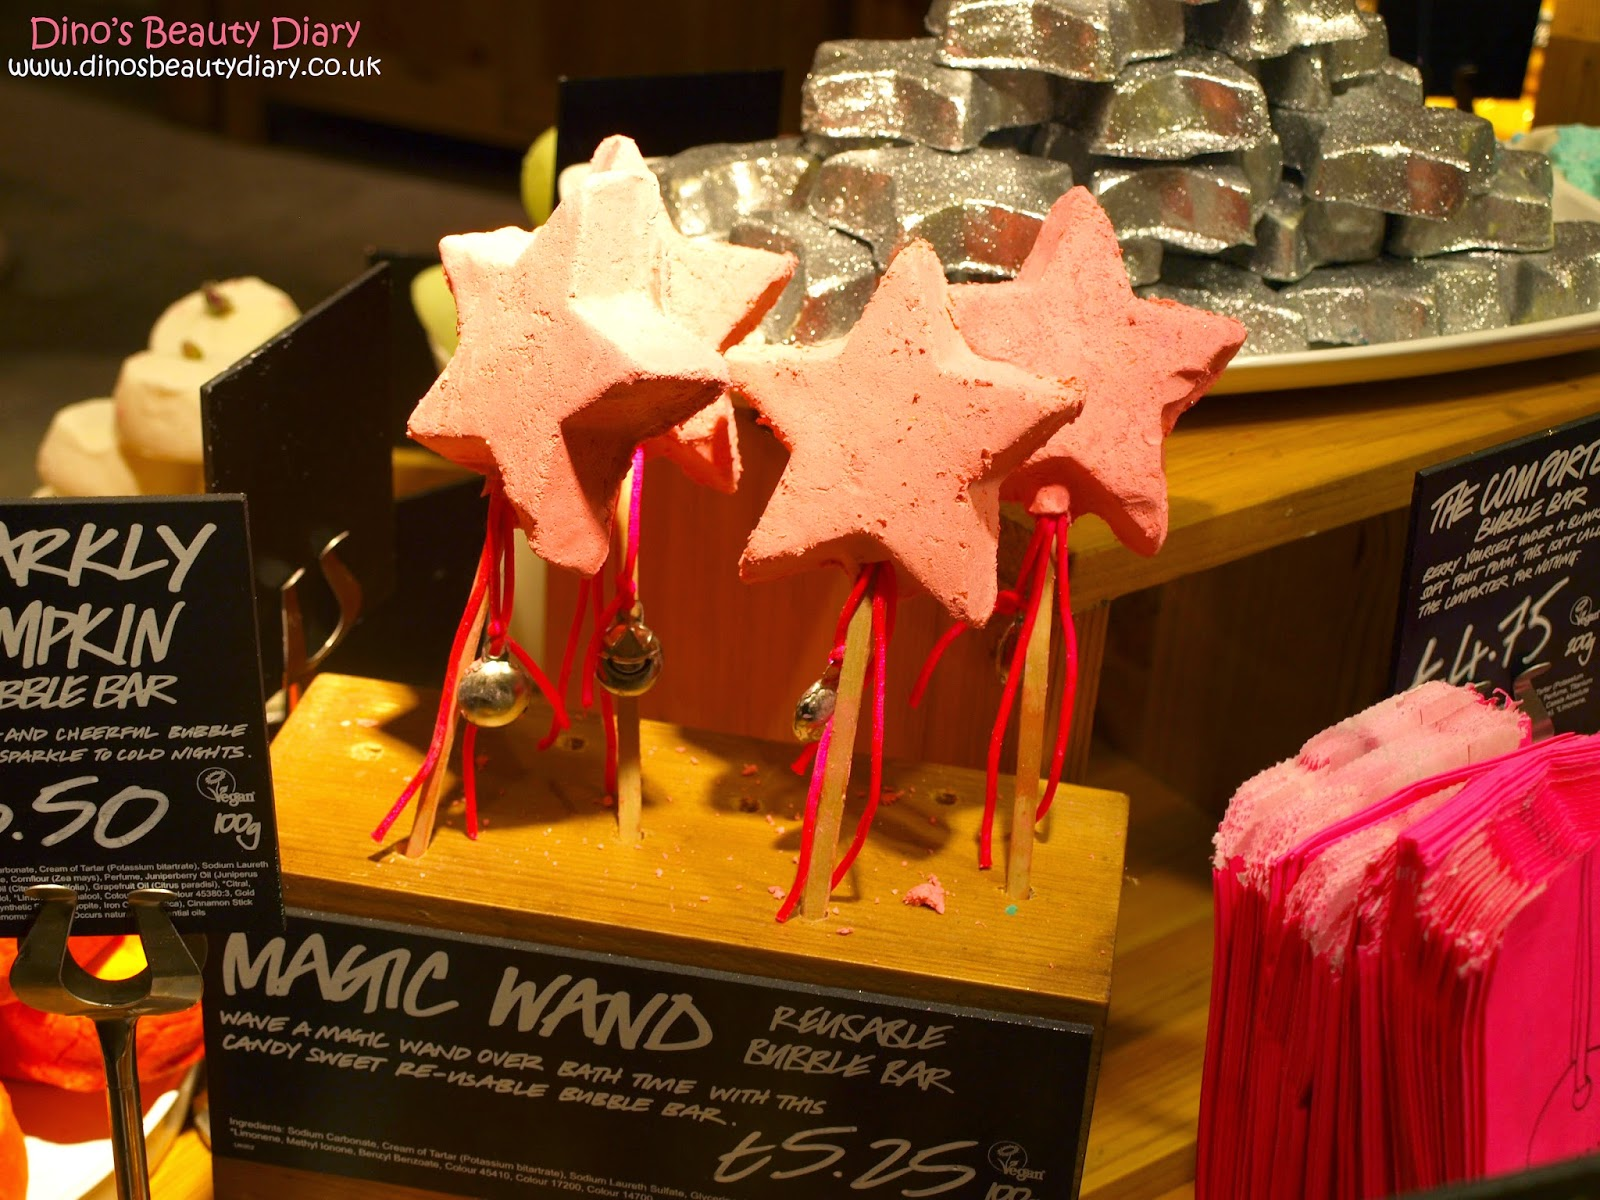 Dino's Beauty Diary - Lush Nottingham Bloggers Event - magic wand bubble bars